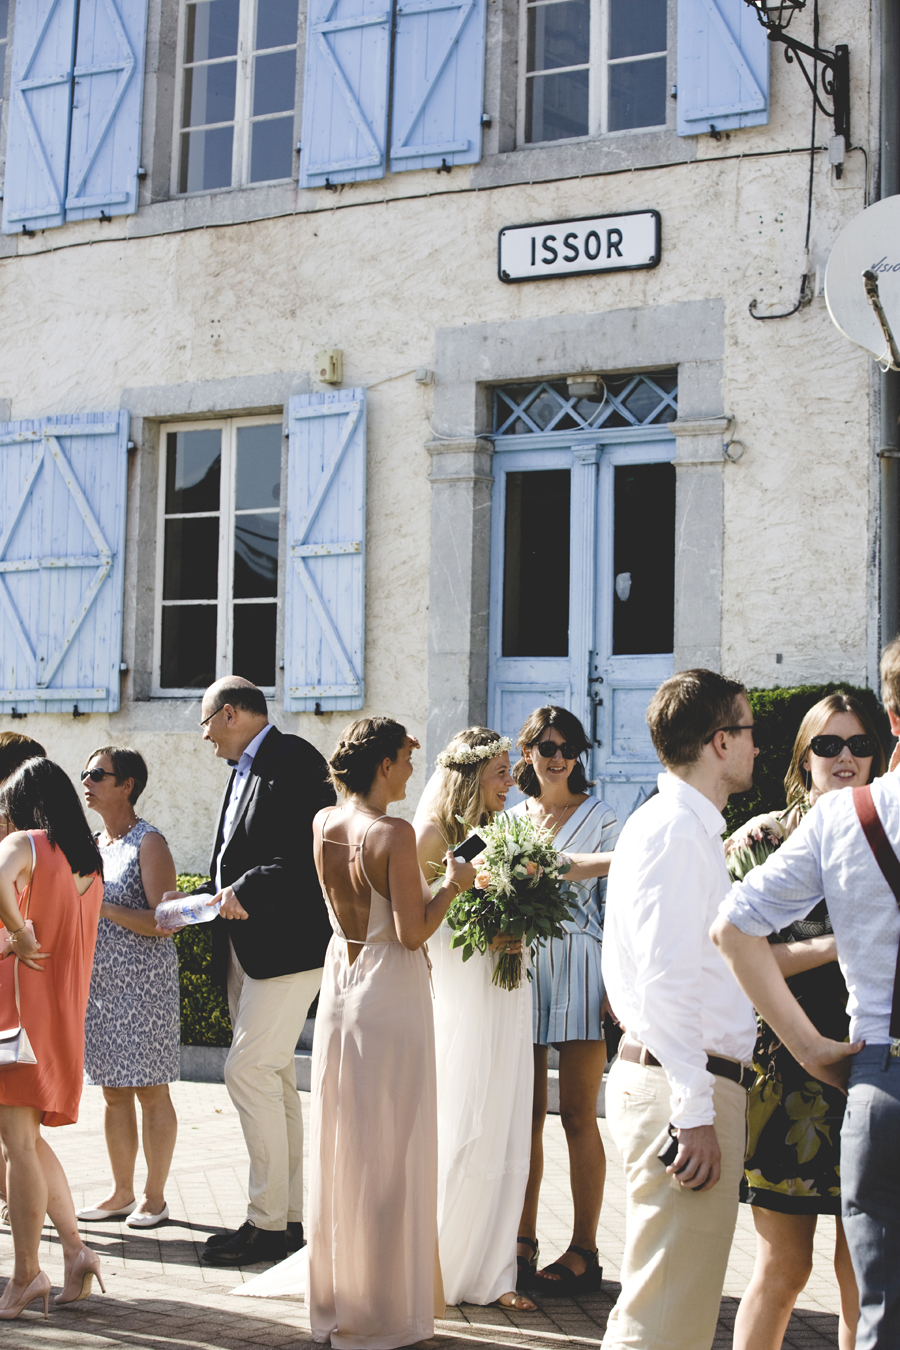 celine_marks_mariage_aurelie_keil_73